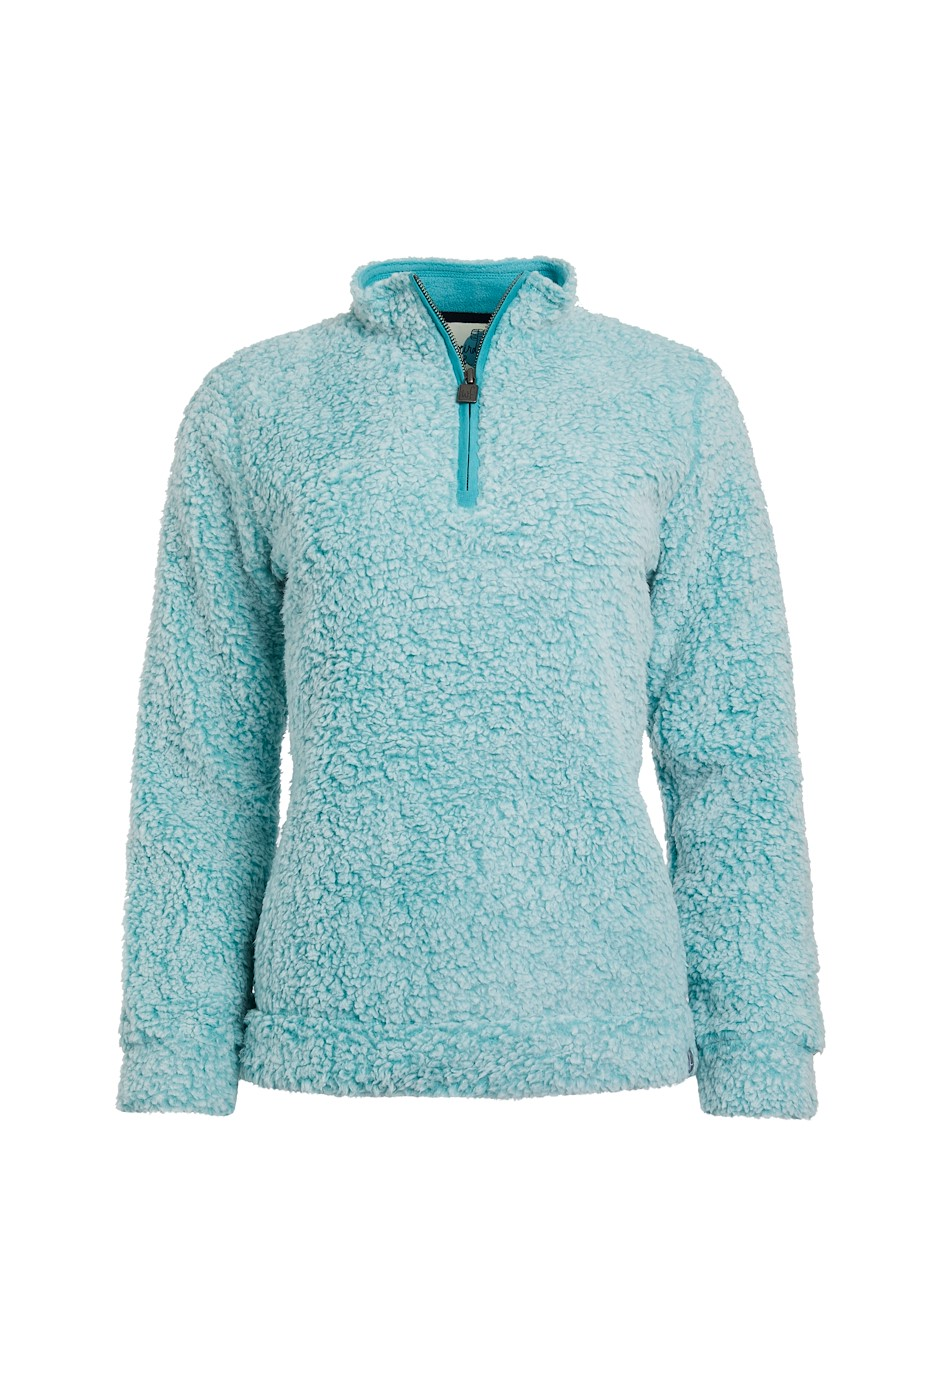 Sheree Cosy 1/4 Zip Fleece Adriatic Blue